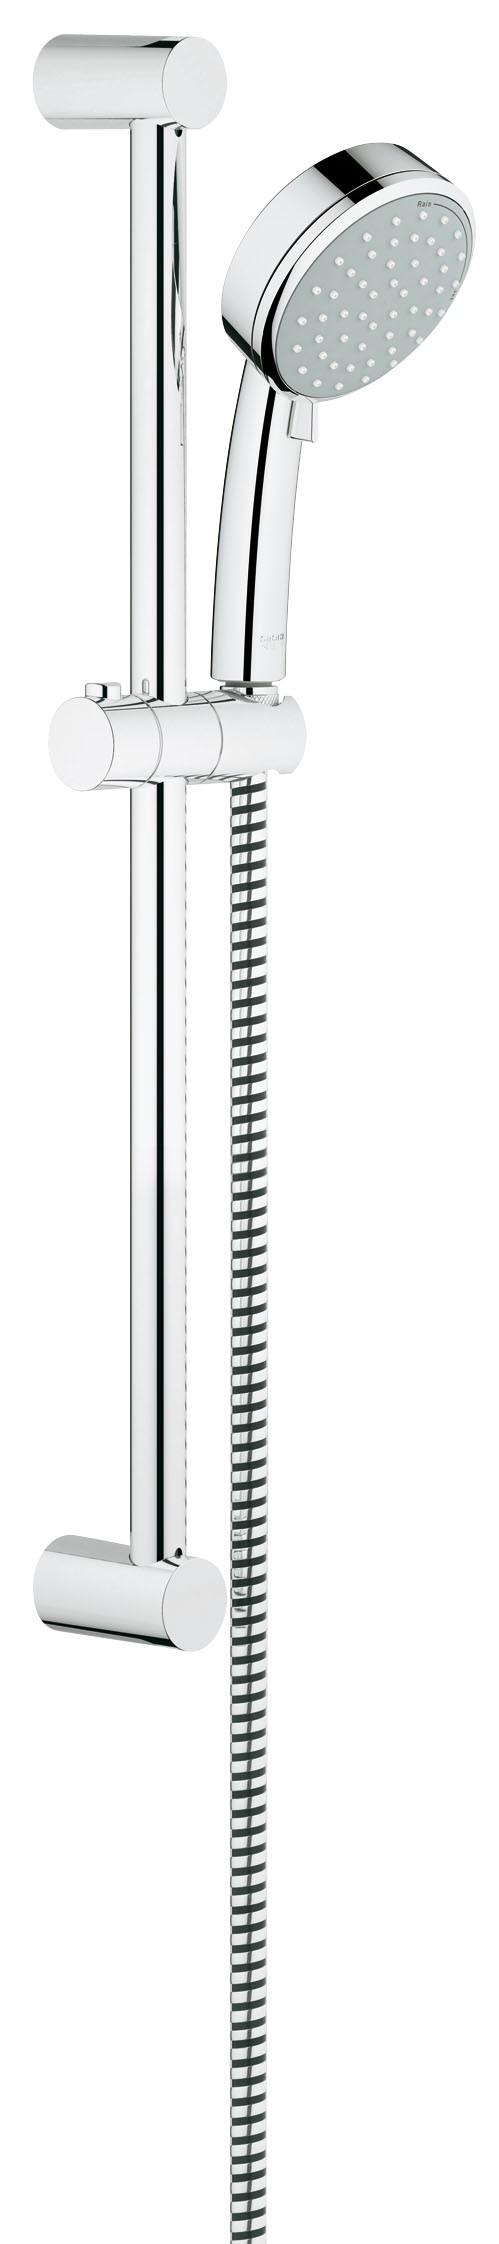 Grohe 27578001 Tempesta Cosmopolitan (ручной душ, штанга 600 мм, шланг 1750 мм), хром